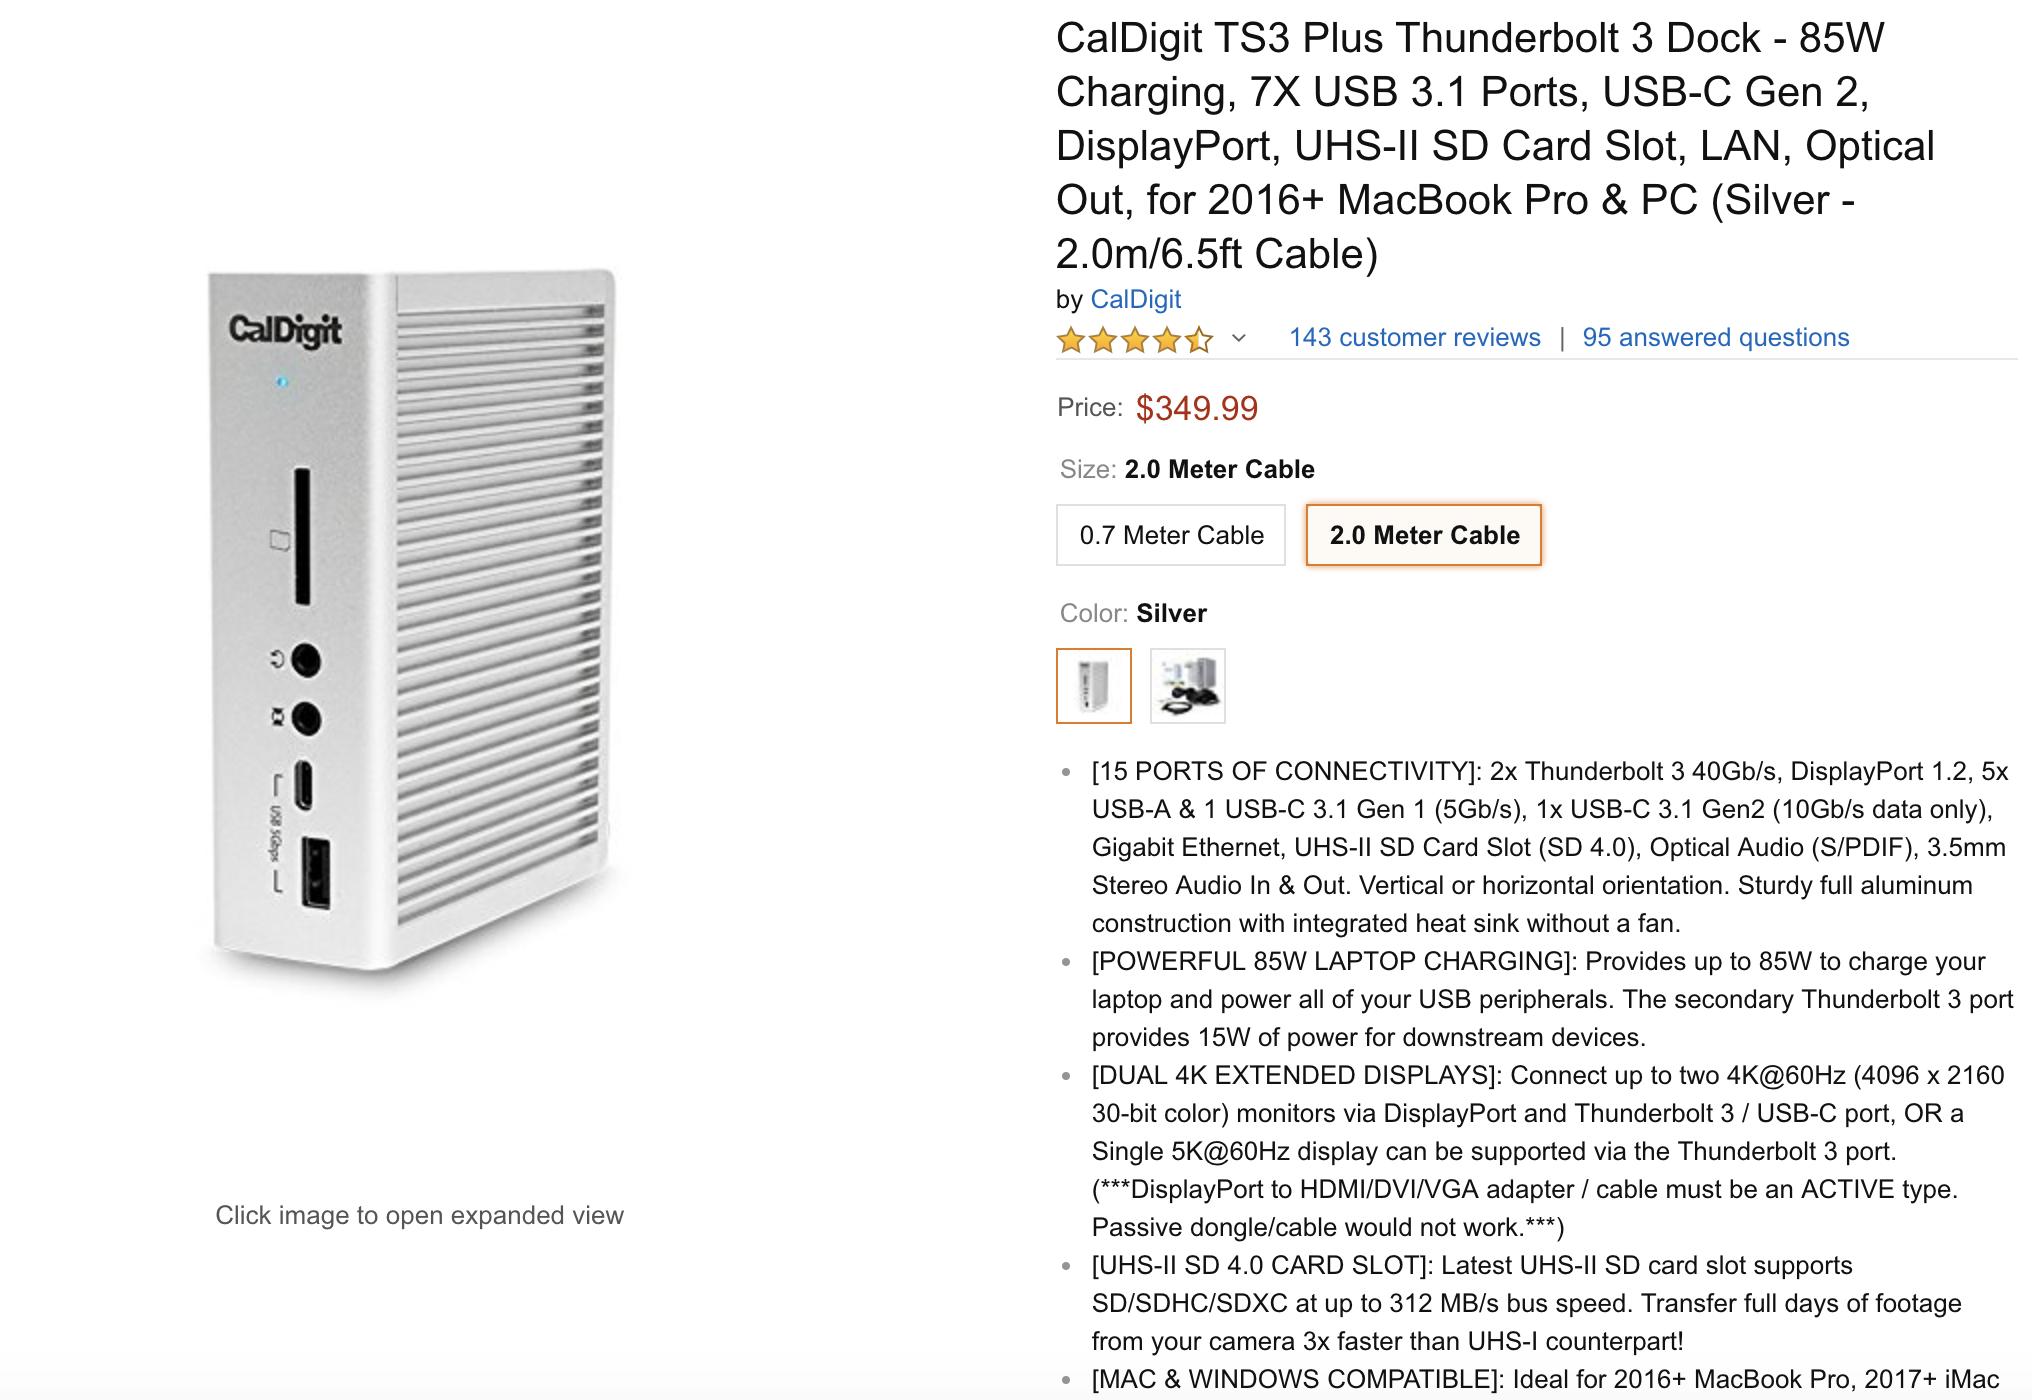 CalDigit TS3 Plus Thunderbolt 3 Dock from Amazon